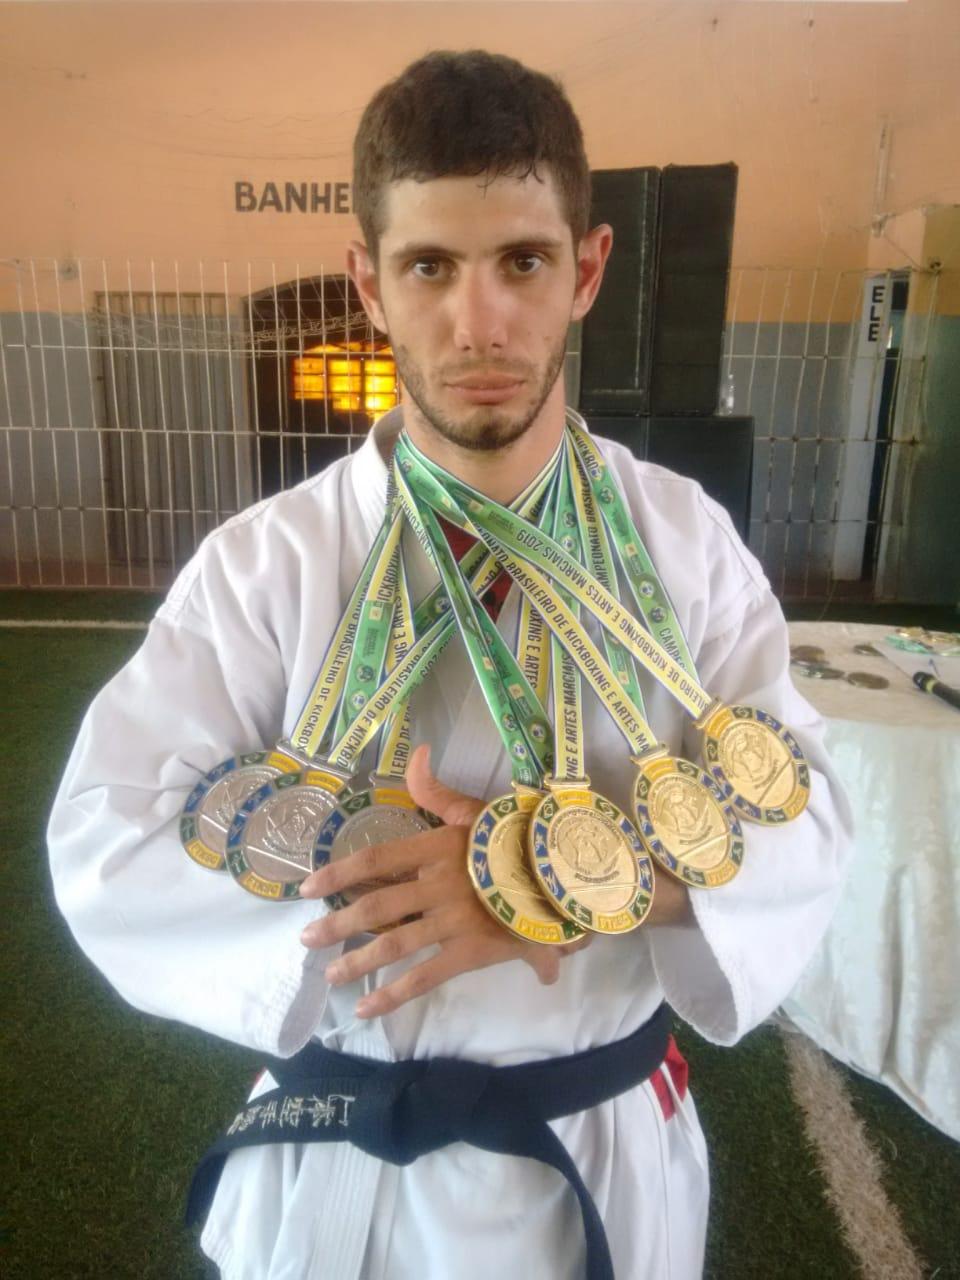 Goiano conquista Campeonato Brasileiro de Kickboxing